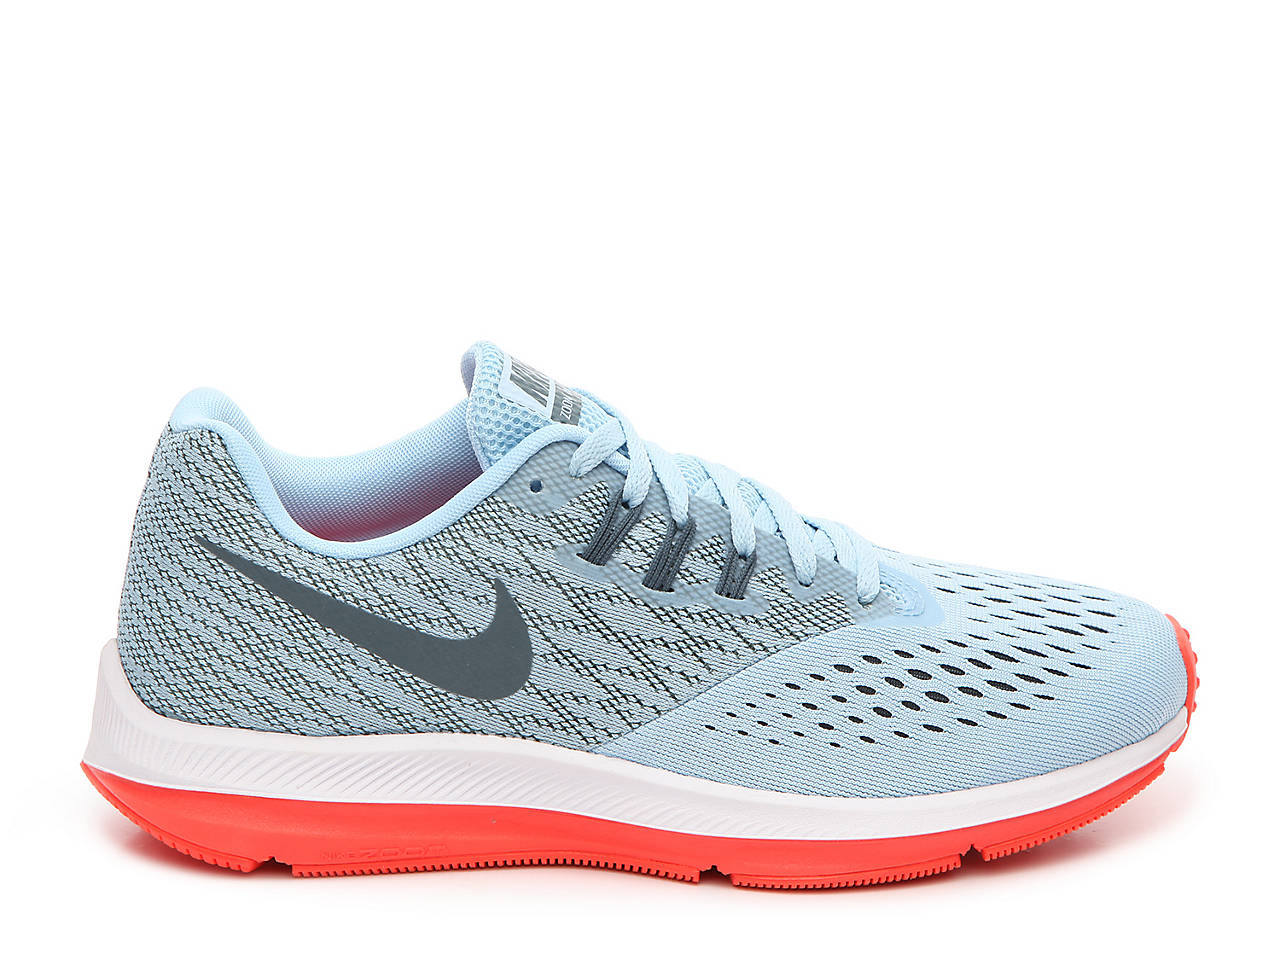 44b8631ce91af ... lunarglide 8 sneaker 130b5 0e8a1 greece nike zoom winflo 4 lightweight  running shoe womens womens shoes dsw 619e4 74f2d ...